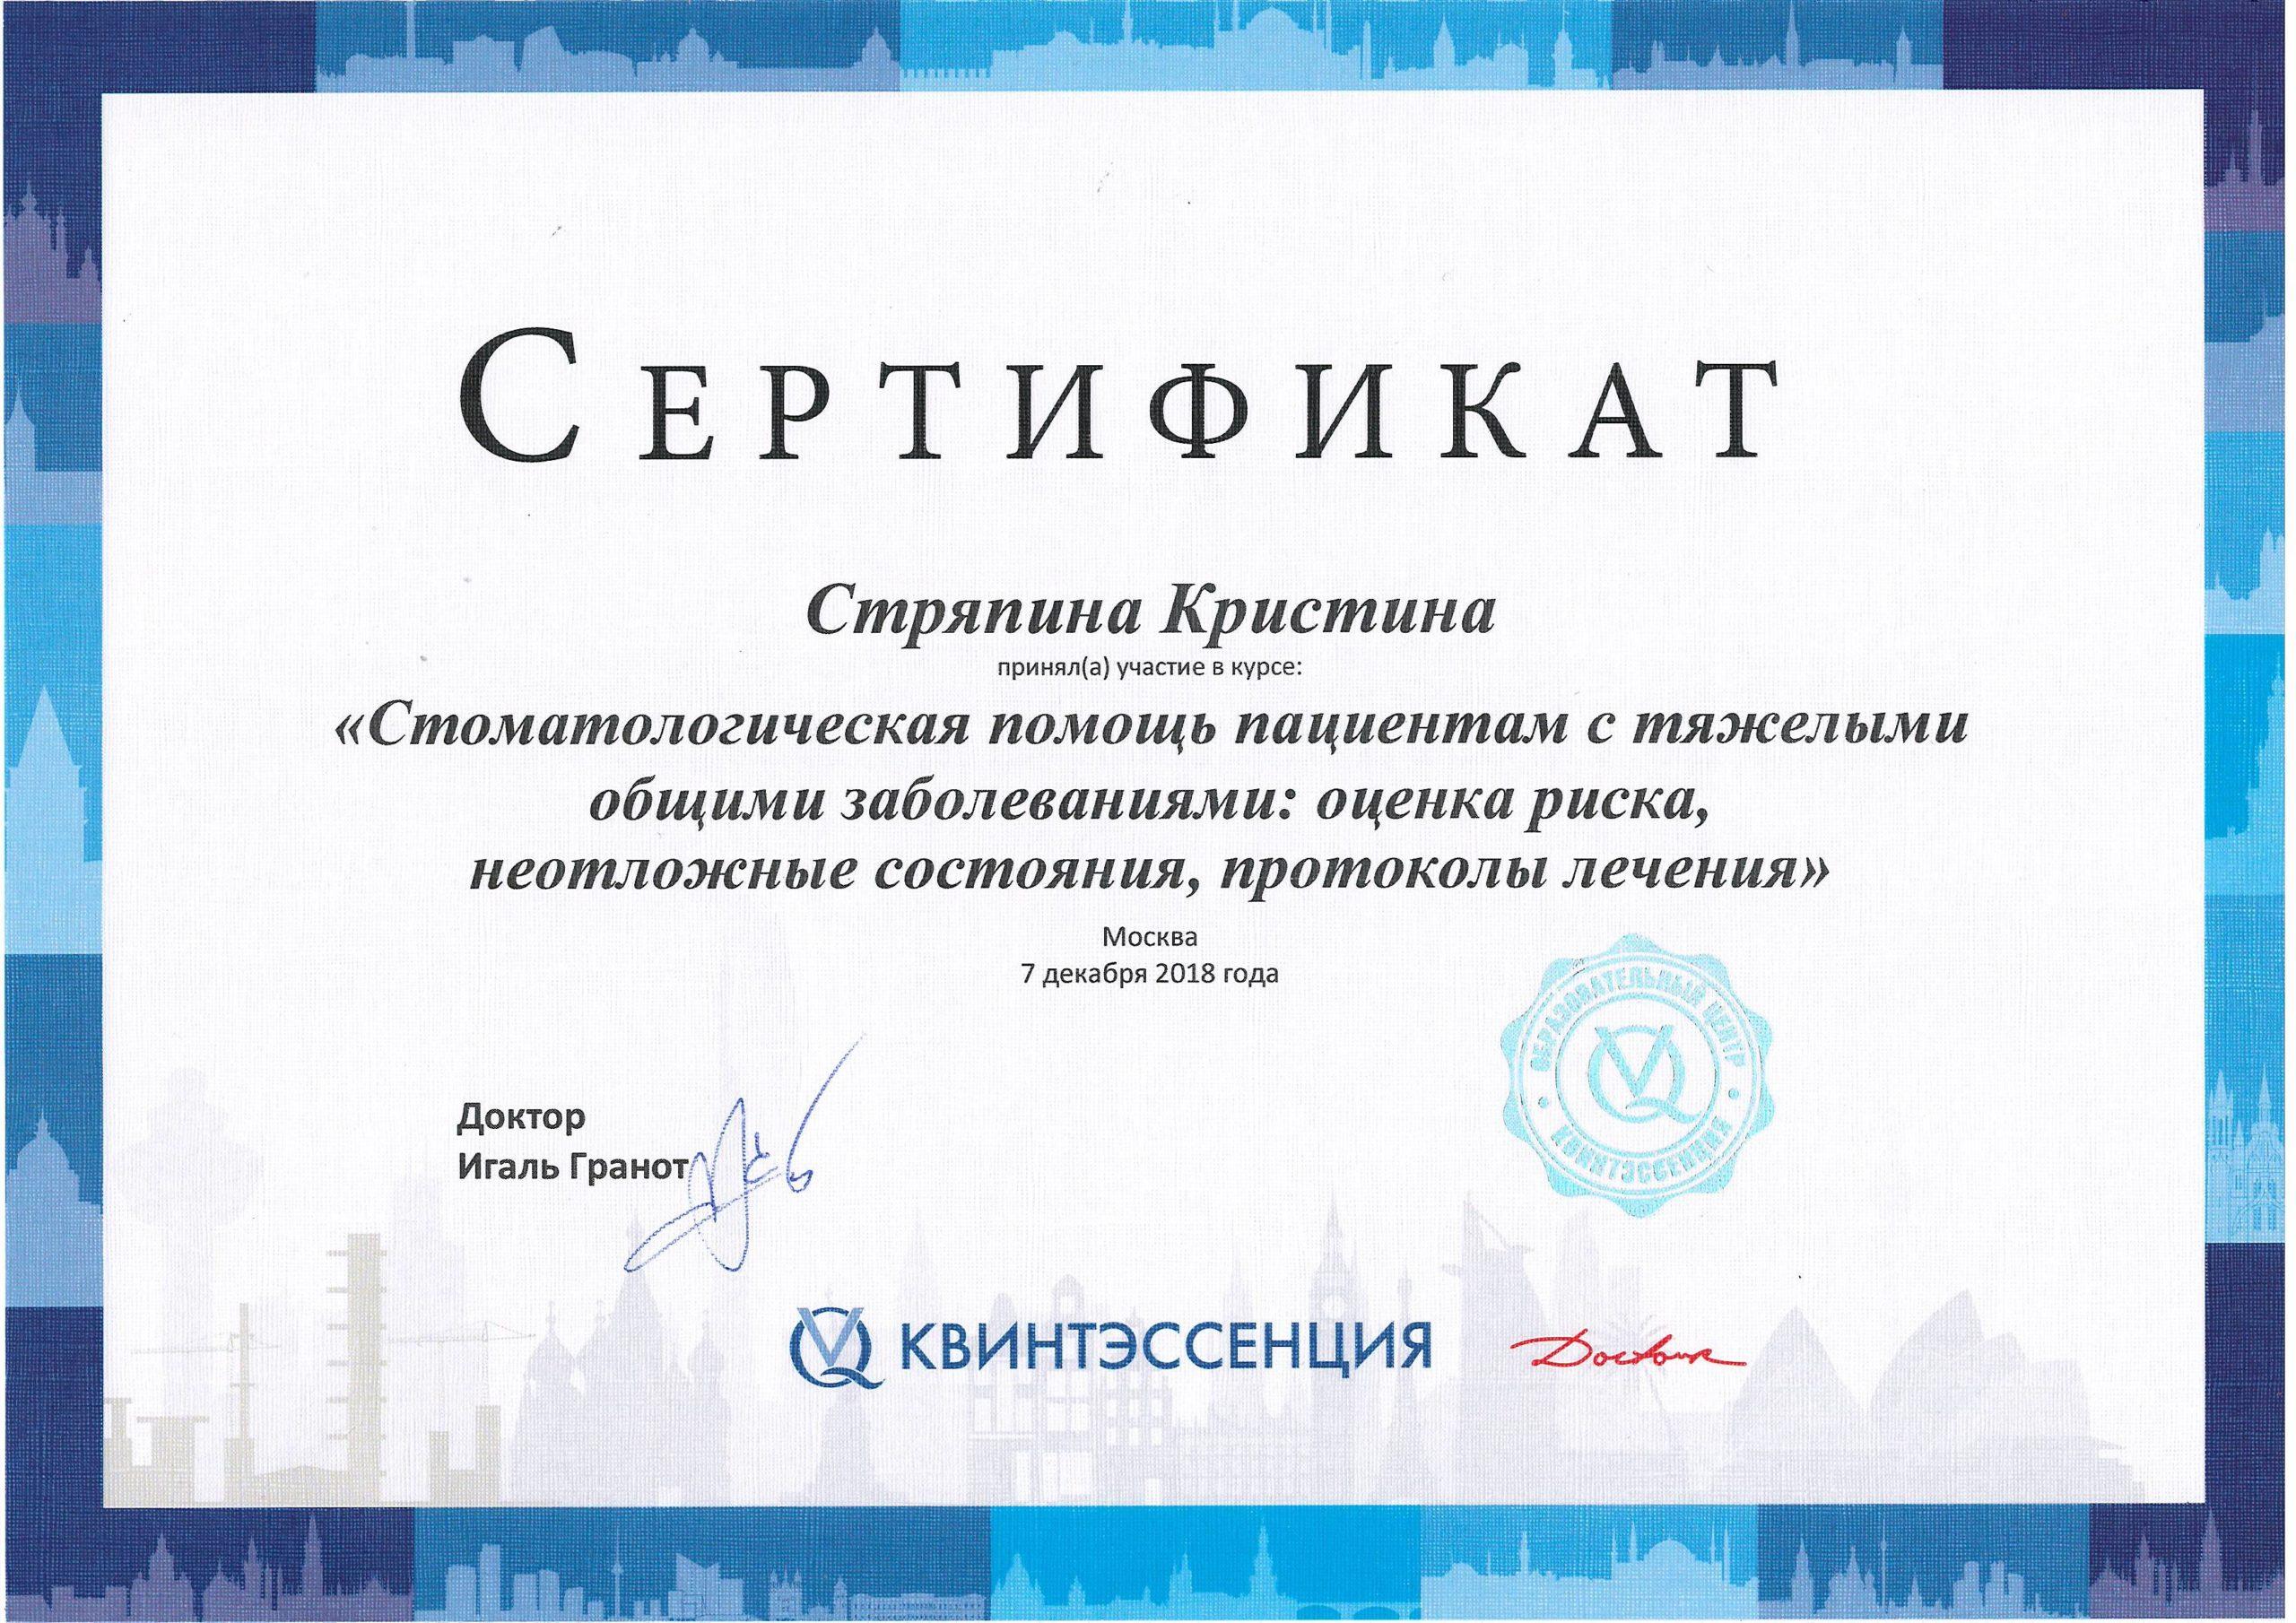 Сертификат Стряпина (Мск 2018)